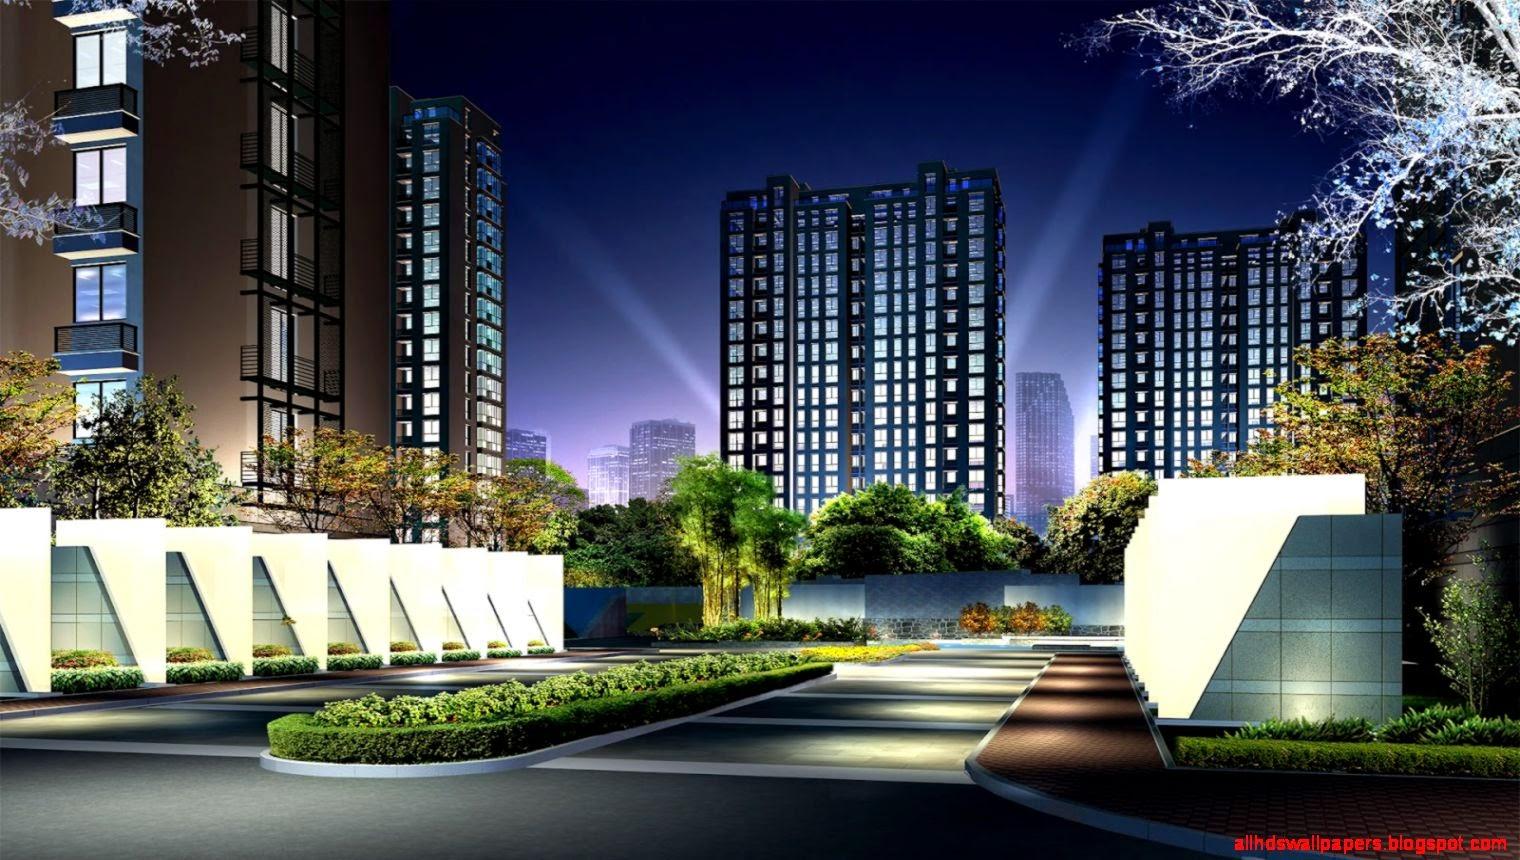 download city architecture wallpaper - photo #28